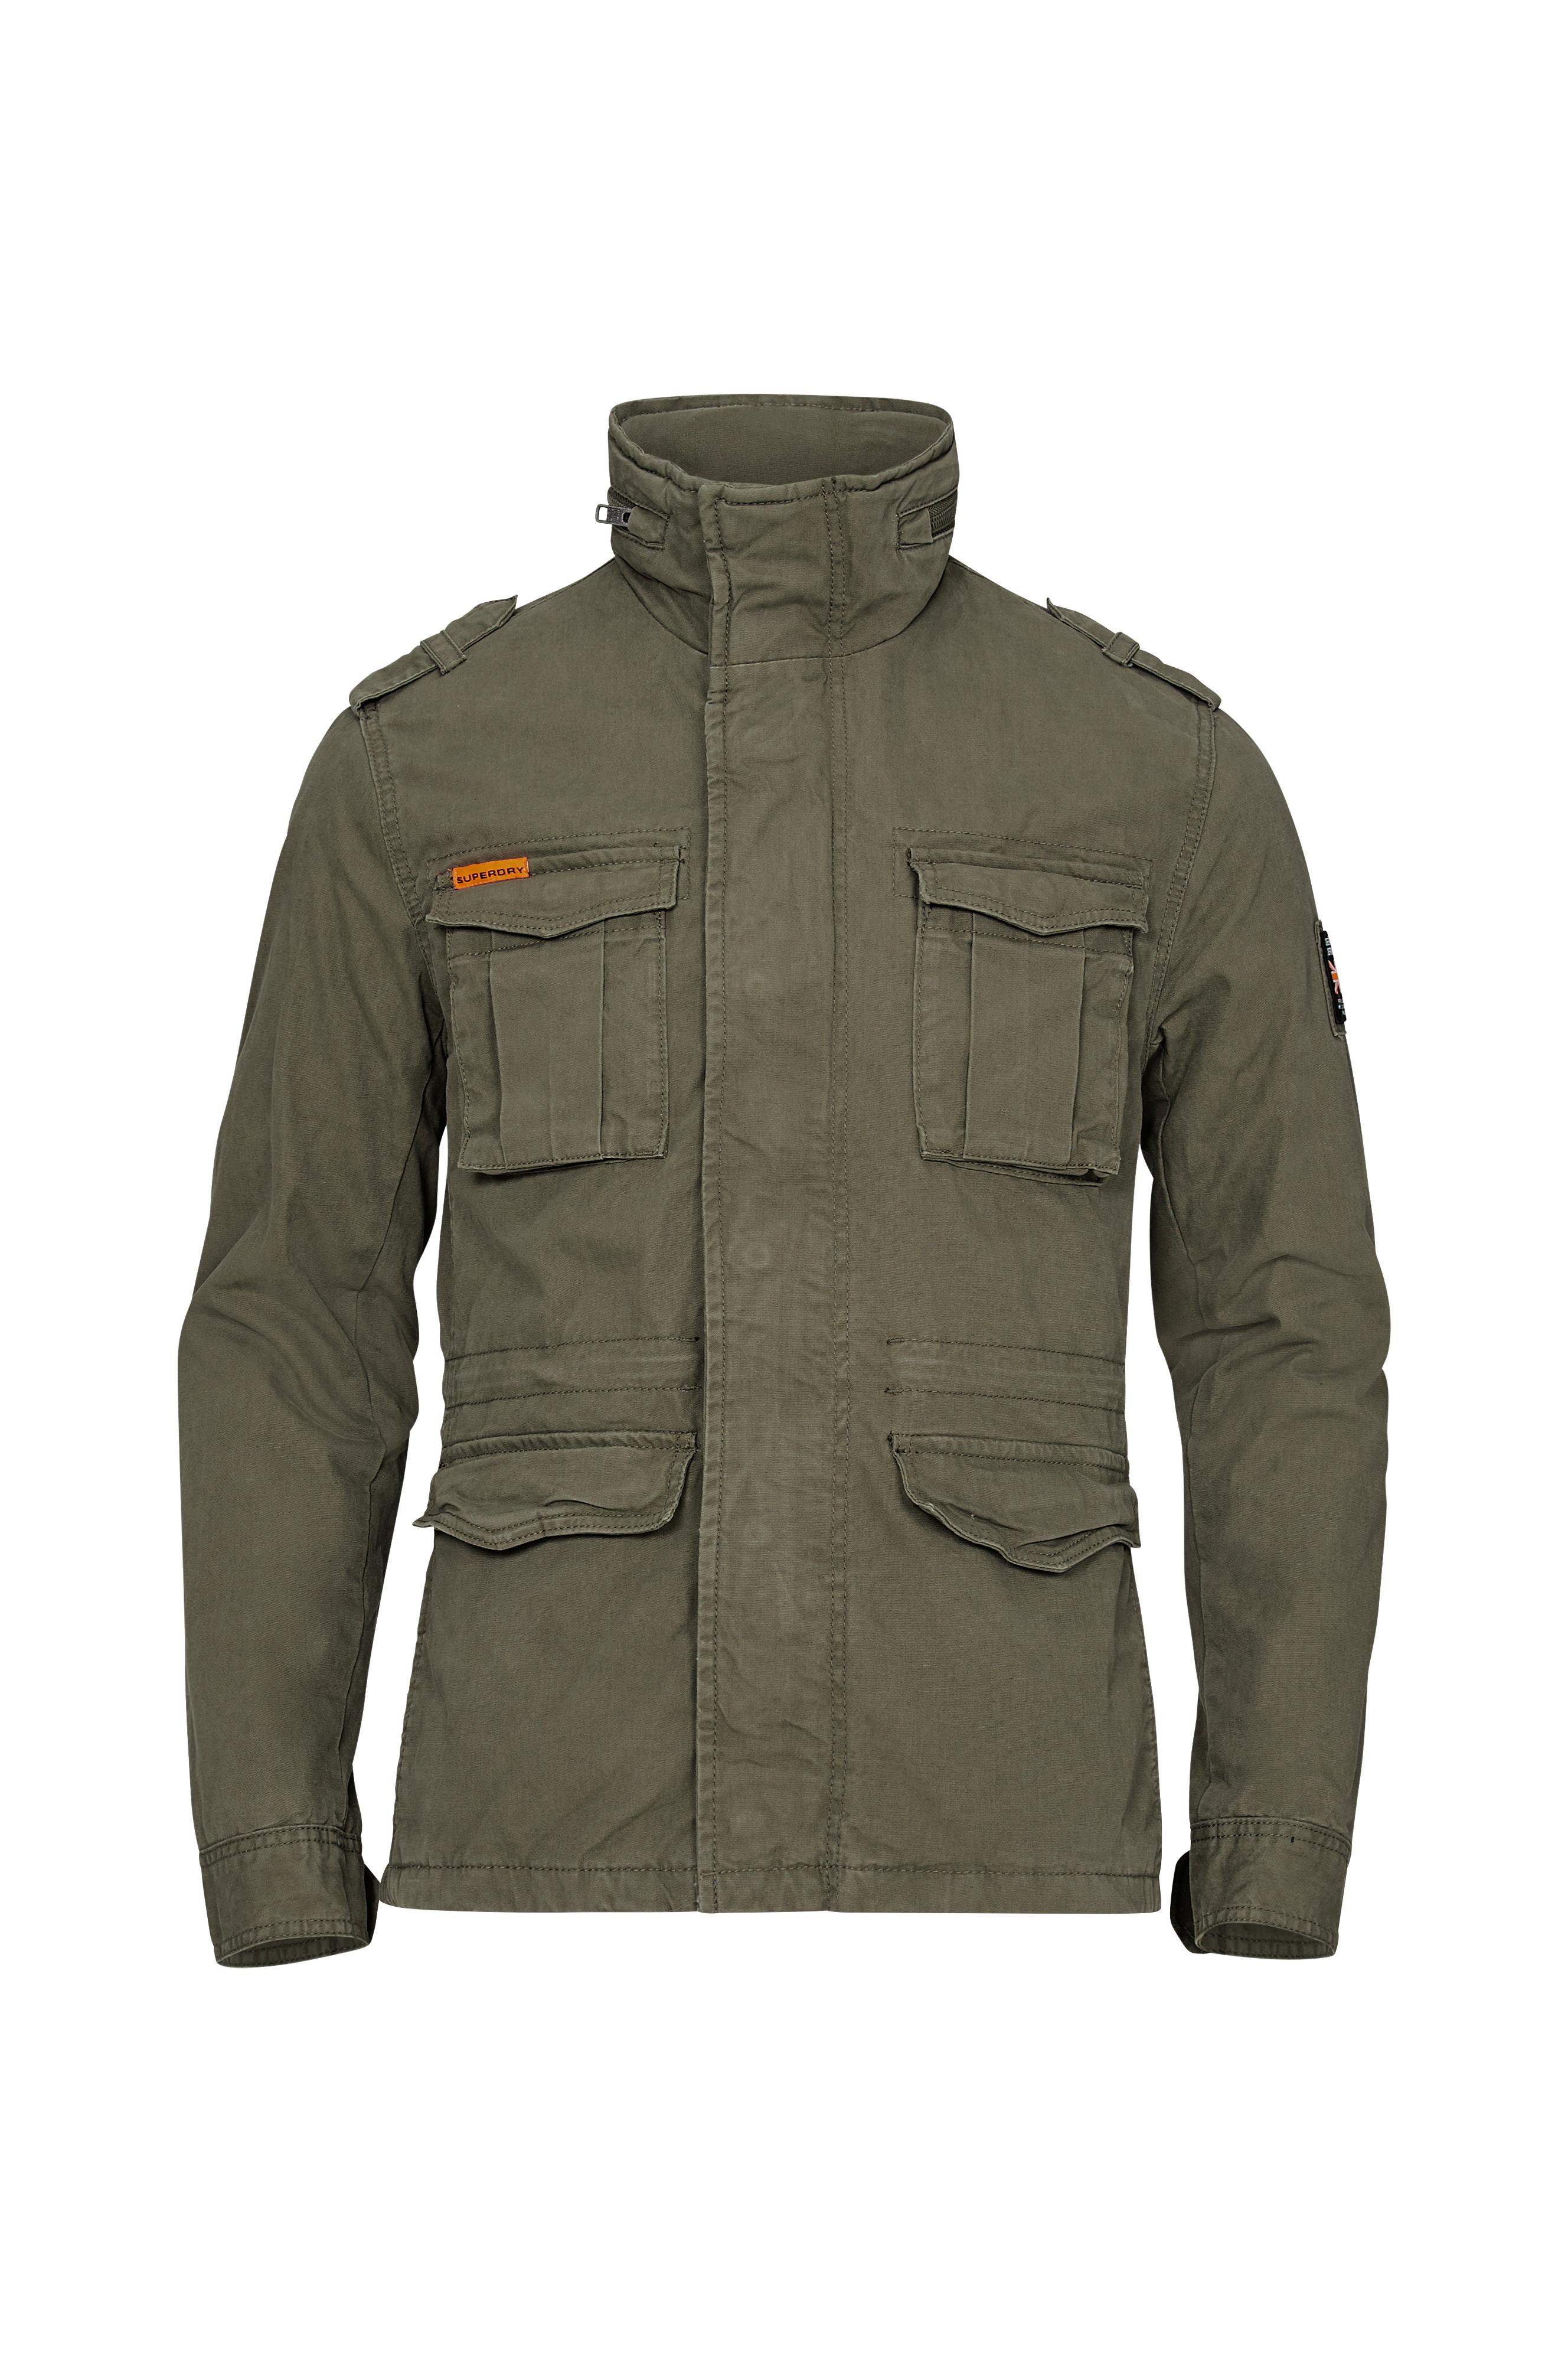 Superdry Jakke Classic Rookie Military Jacket - Grøn - Herre - Ellos.dk